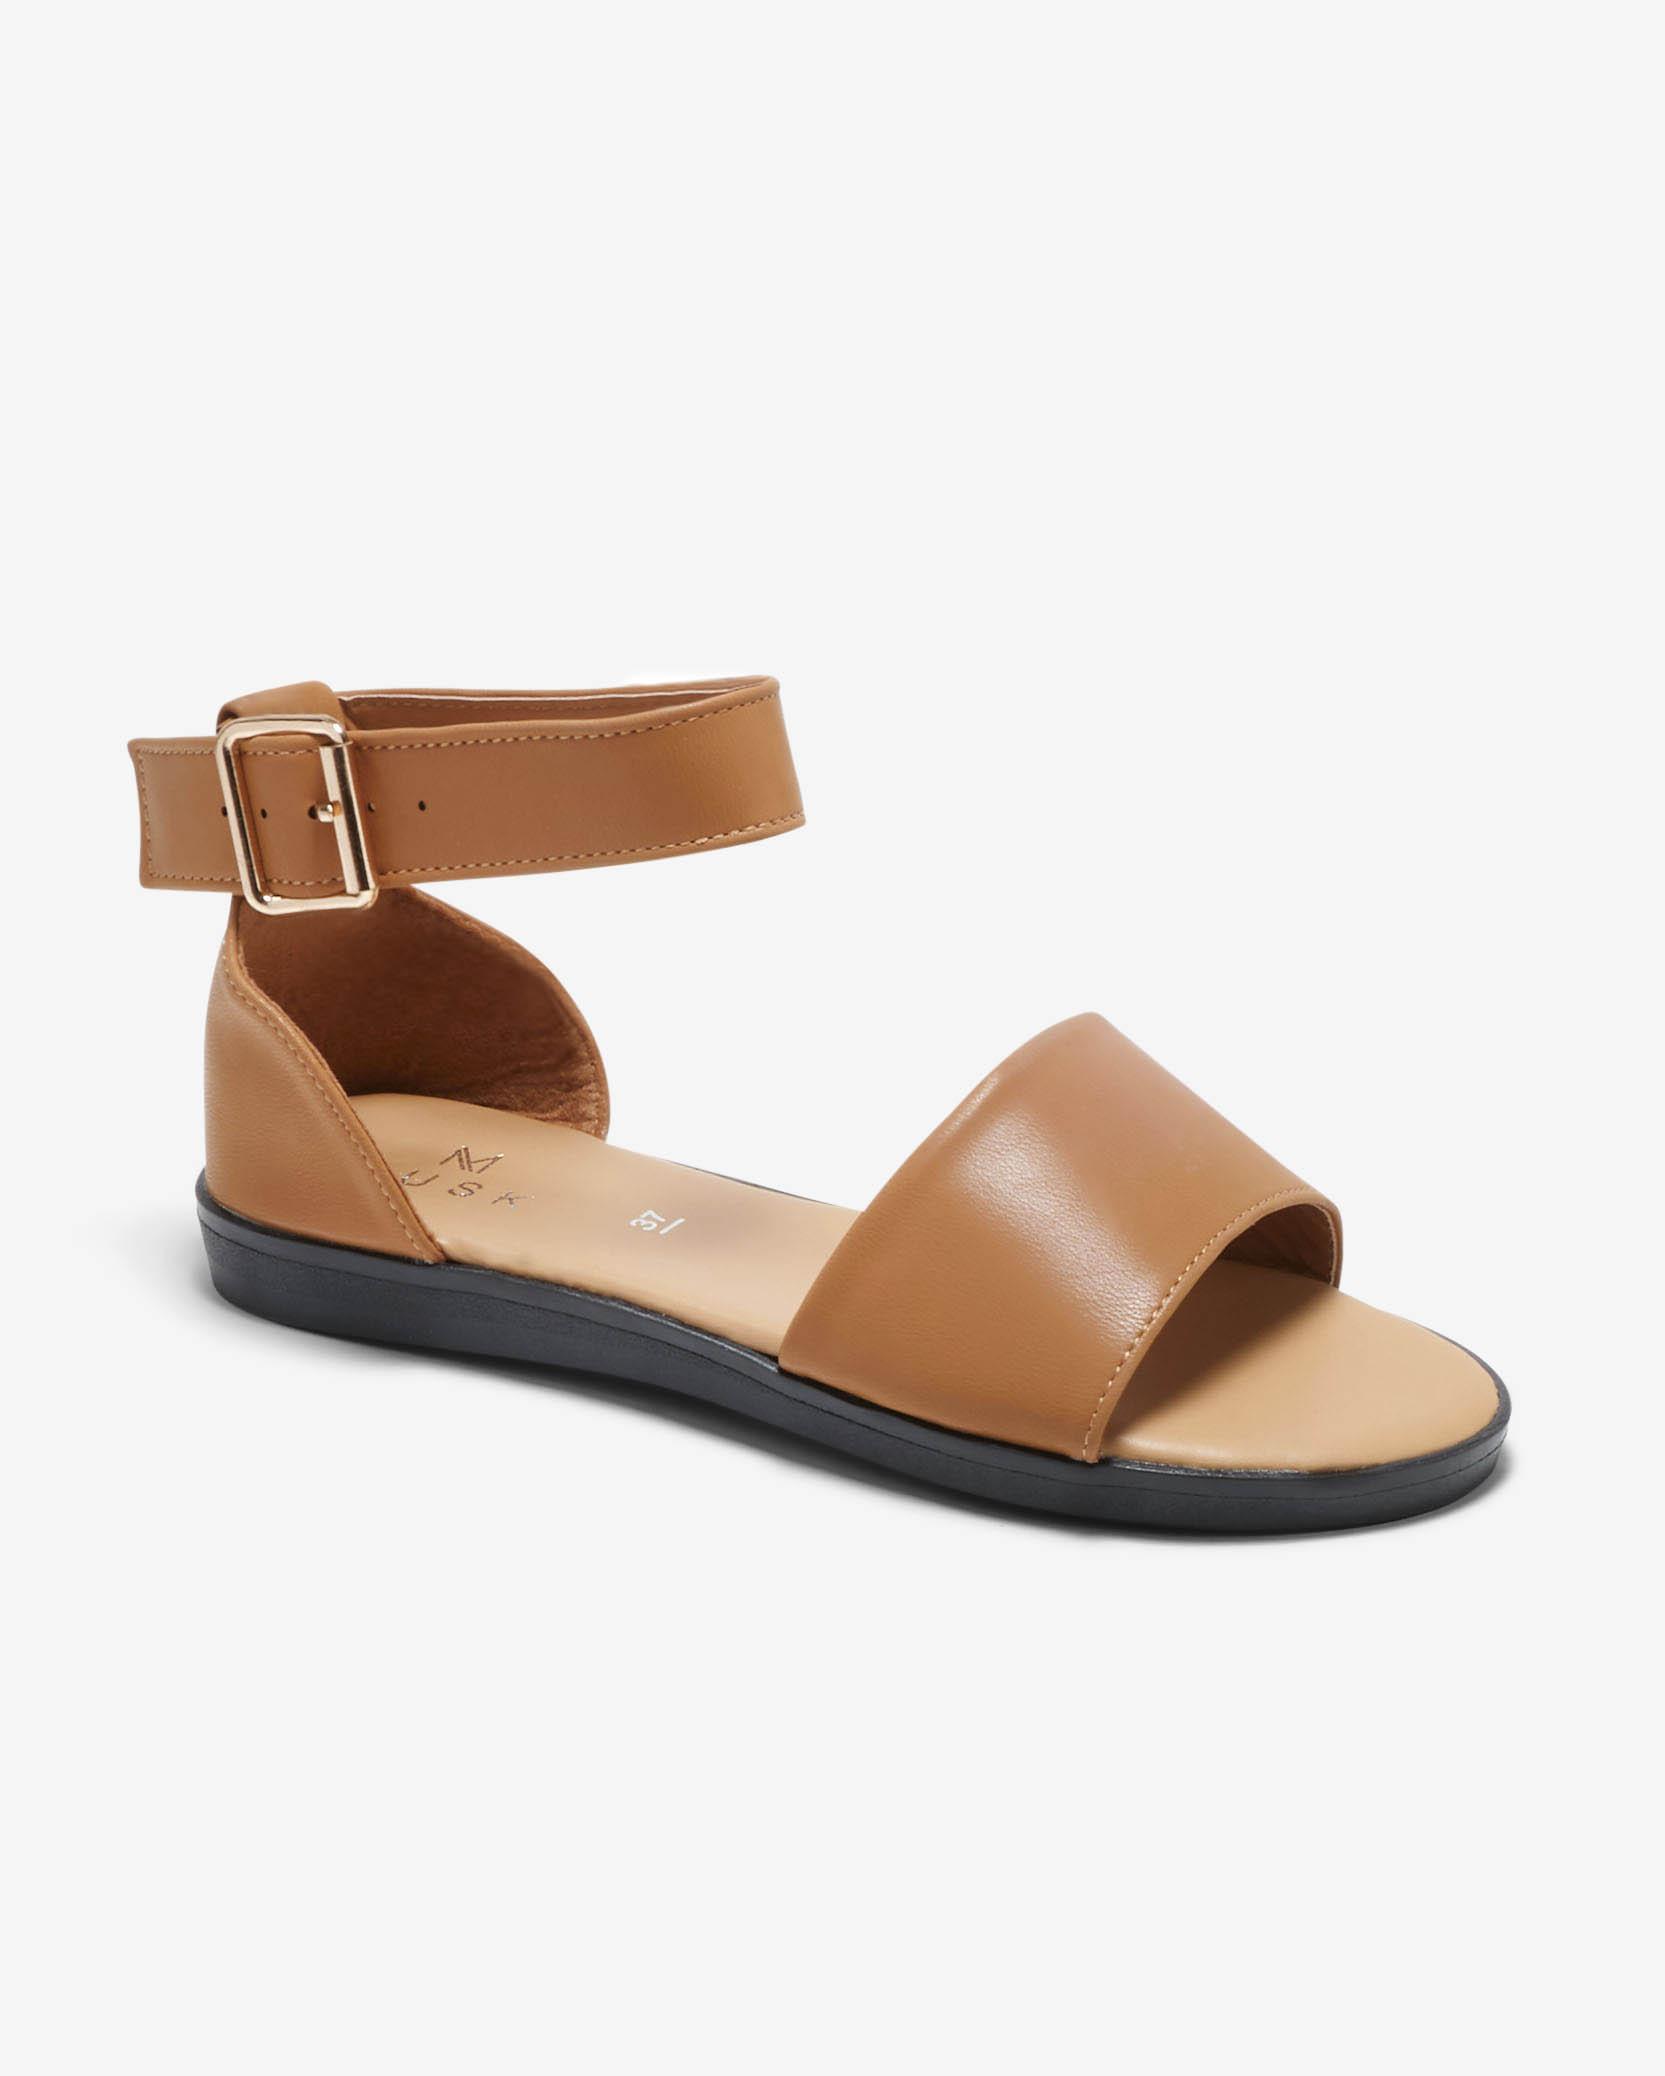 Sandales Plates Femme - Sandale Plate Beige Jina - Mus21062